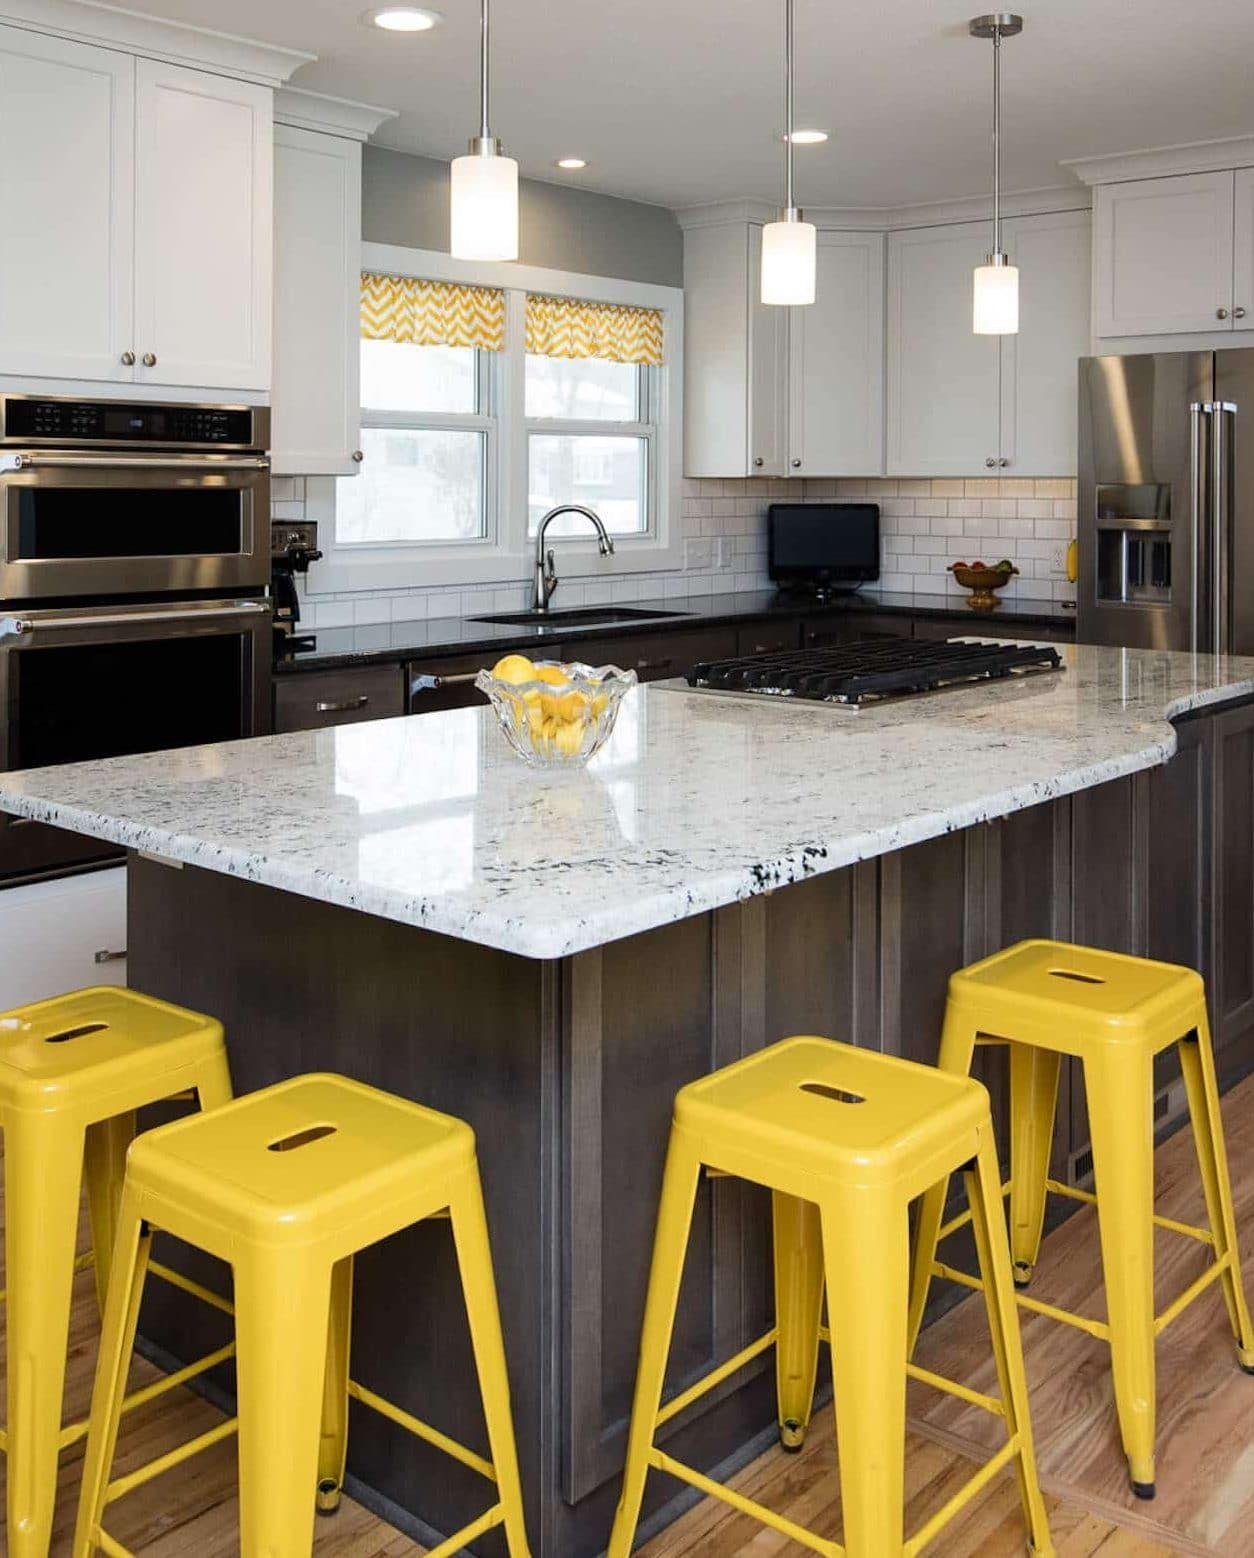 21 Prodigious Kitchen Countertops Granite That Will Inspire